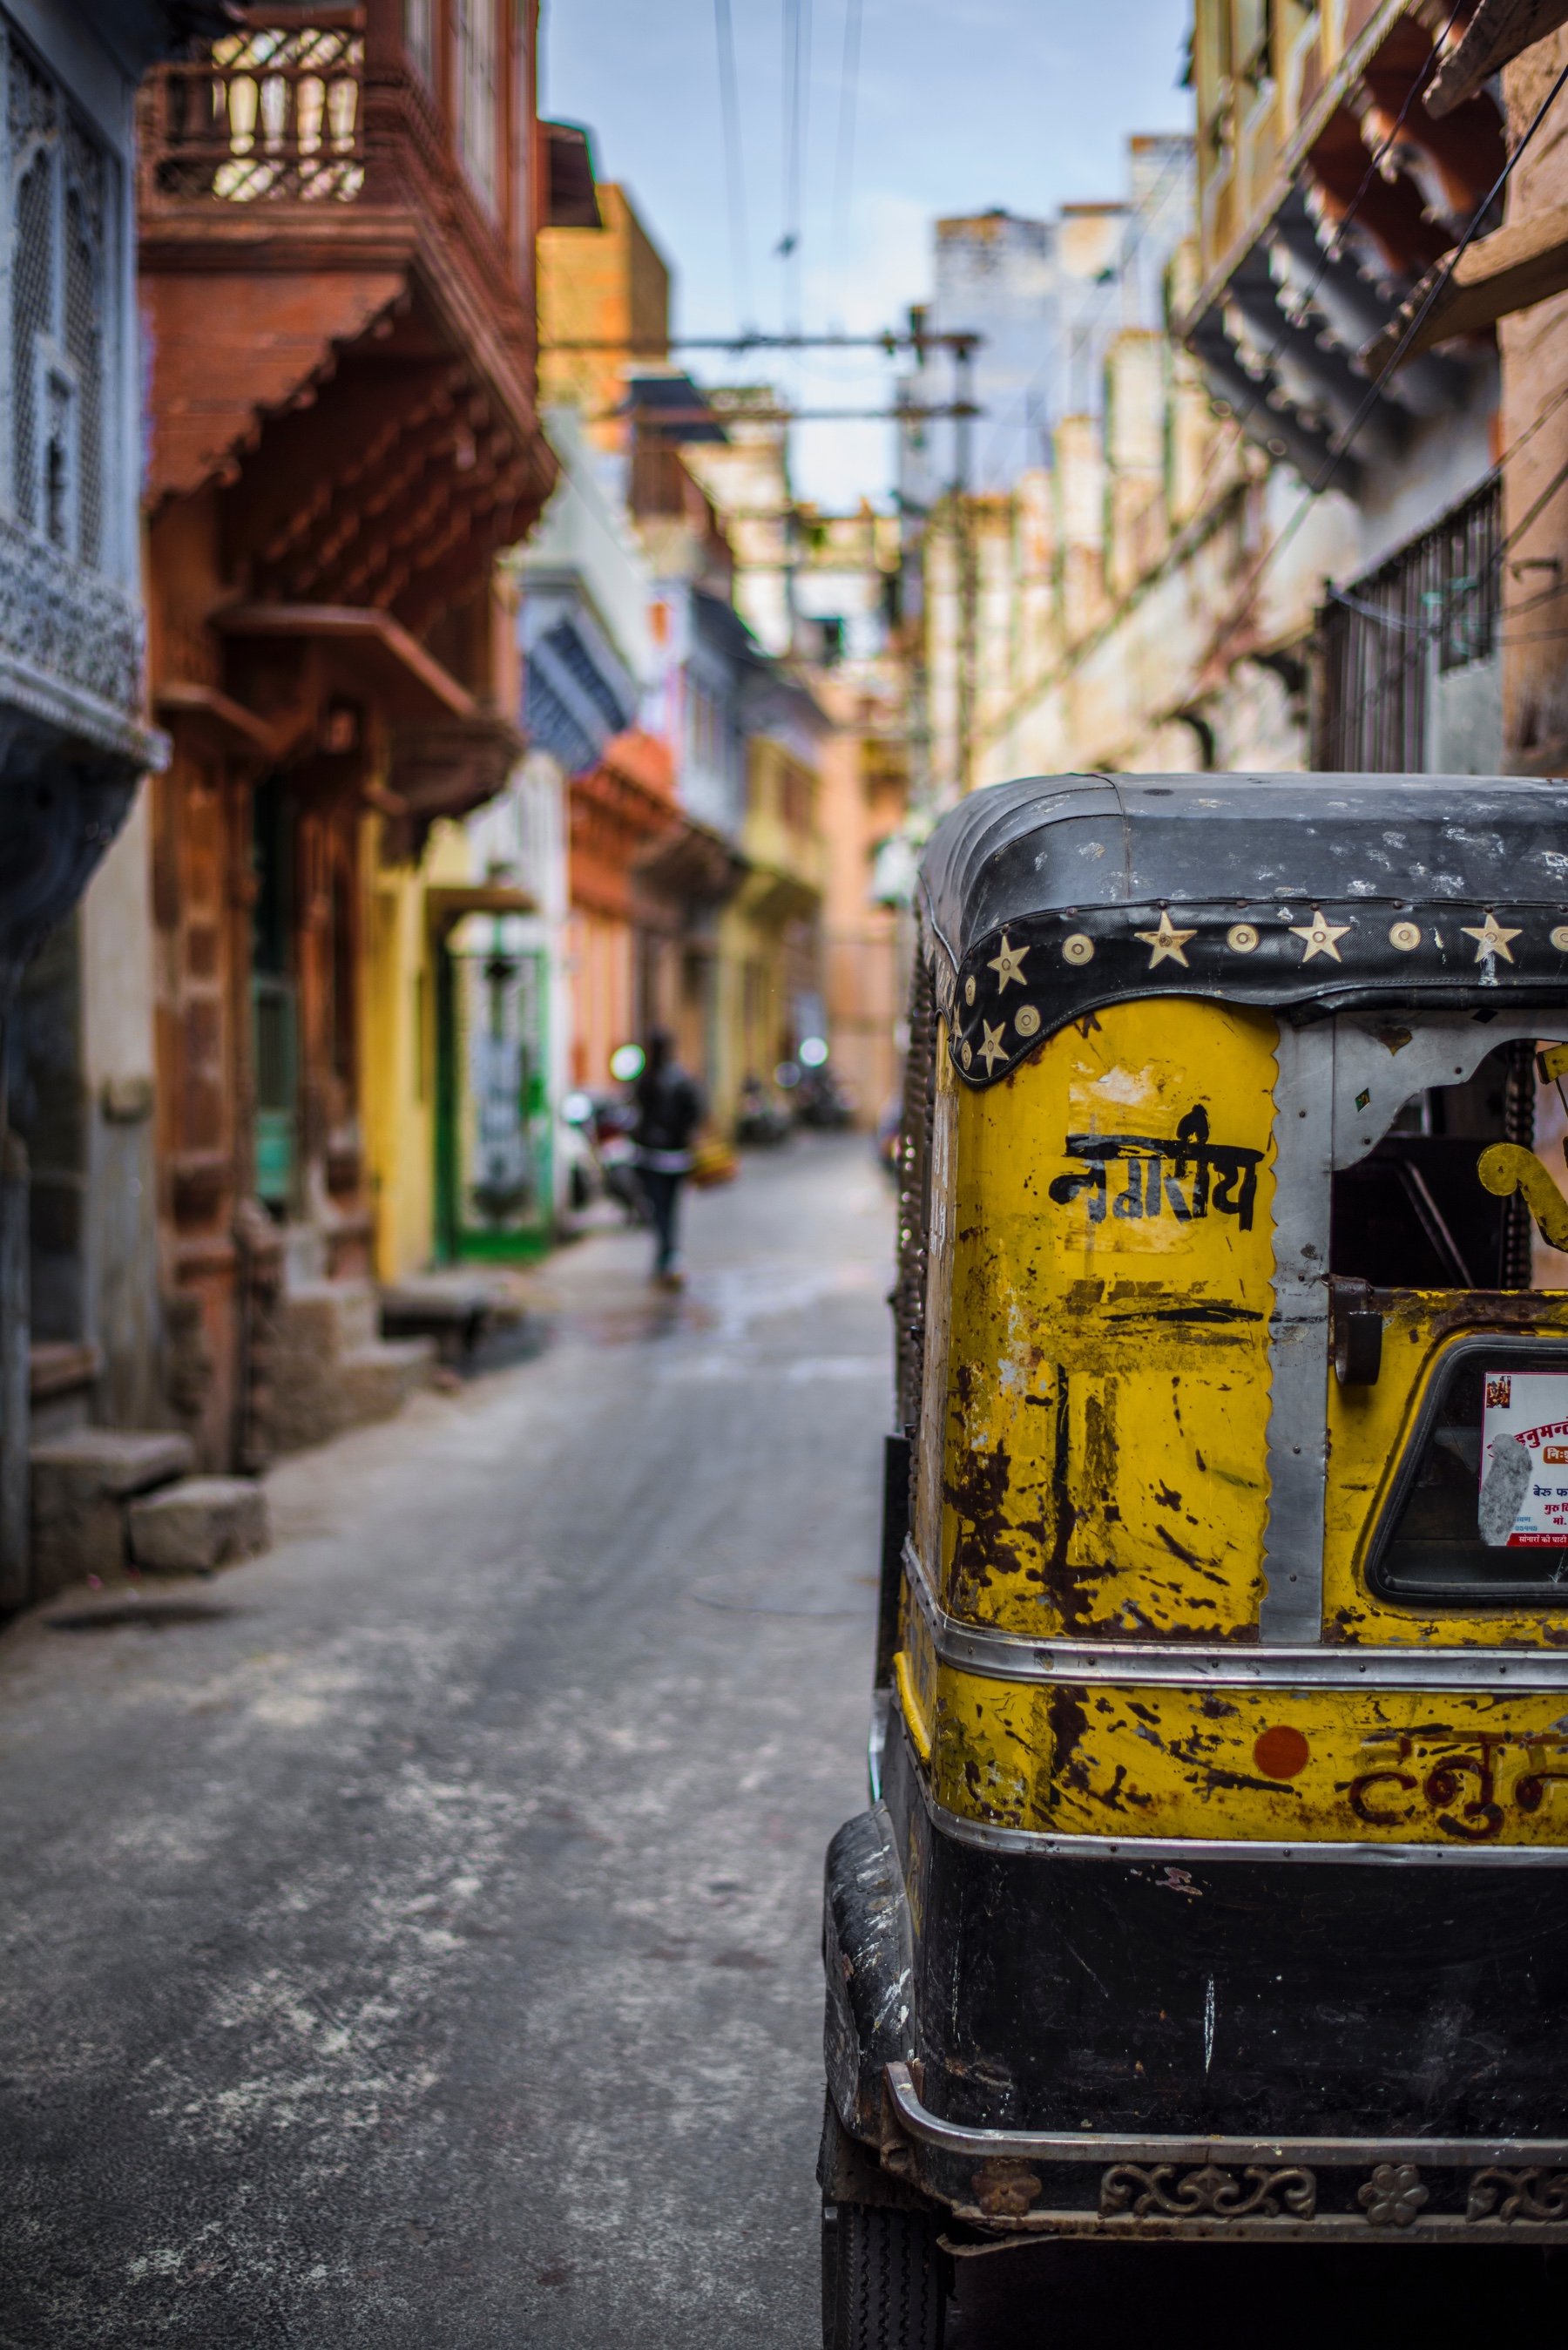 How India Can Aspire to Become a Tourism Destination